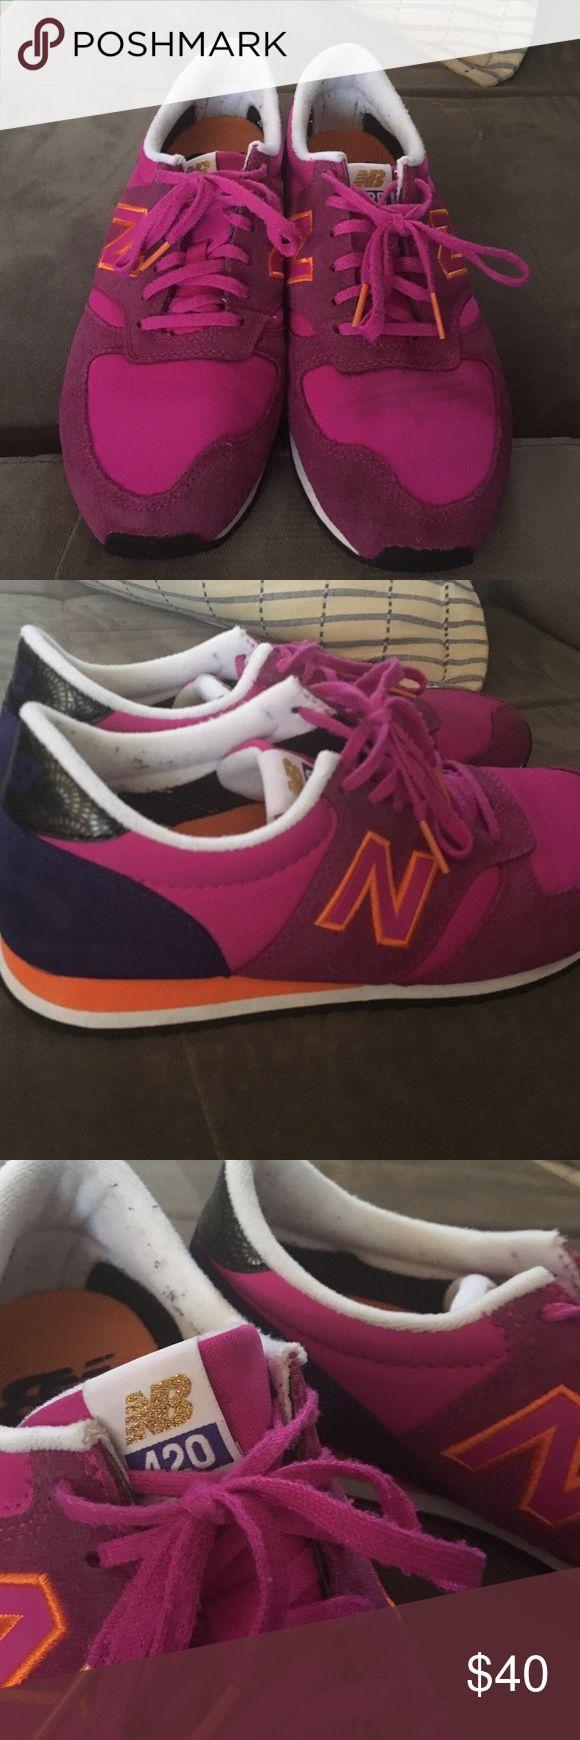 new balance 420 pink